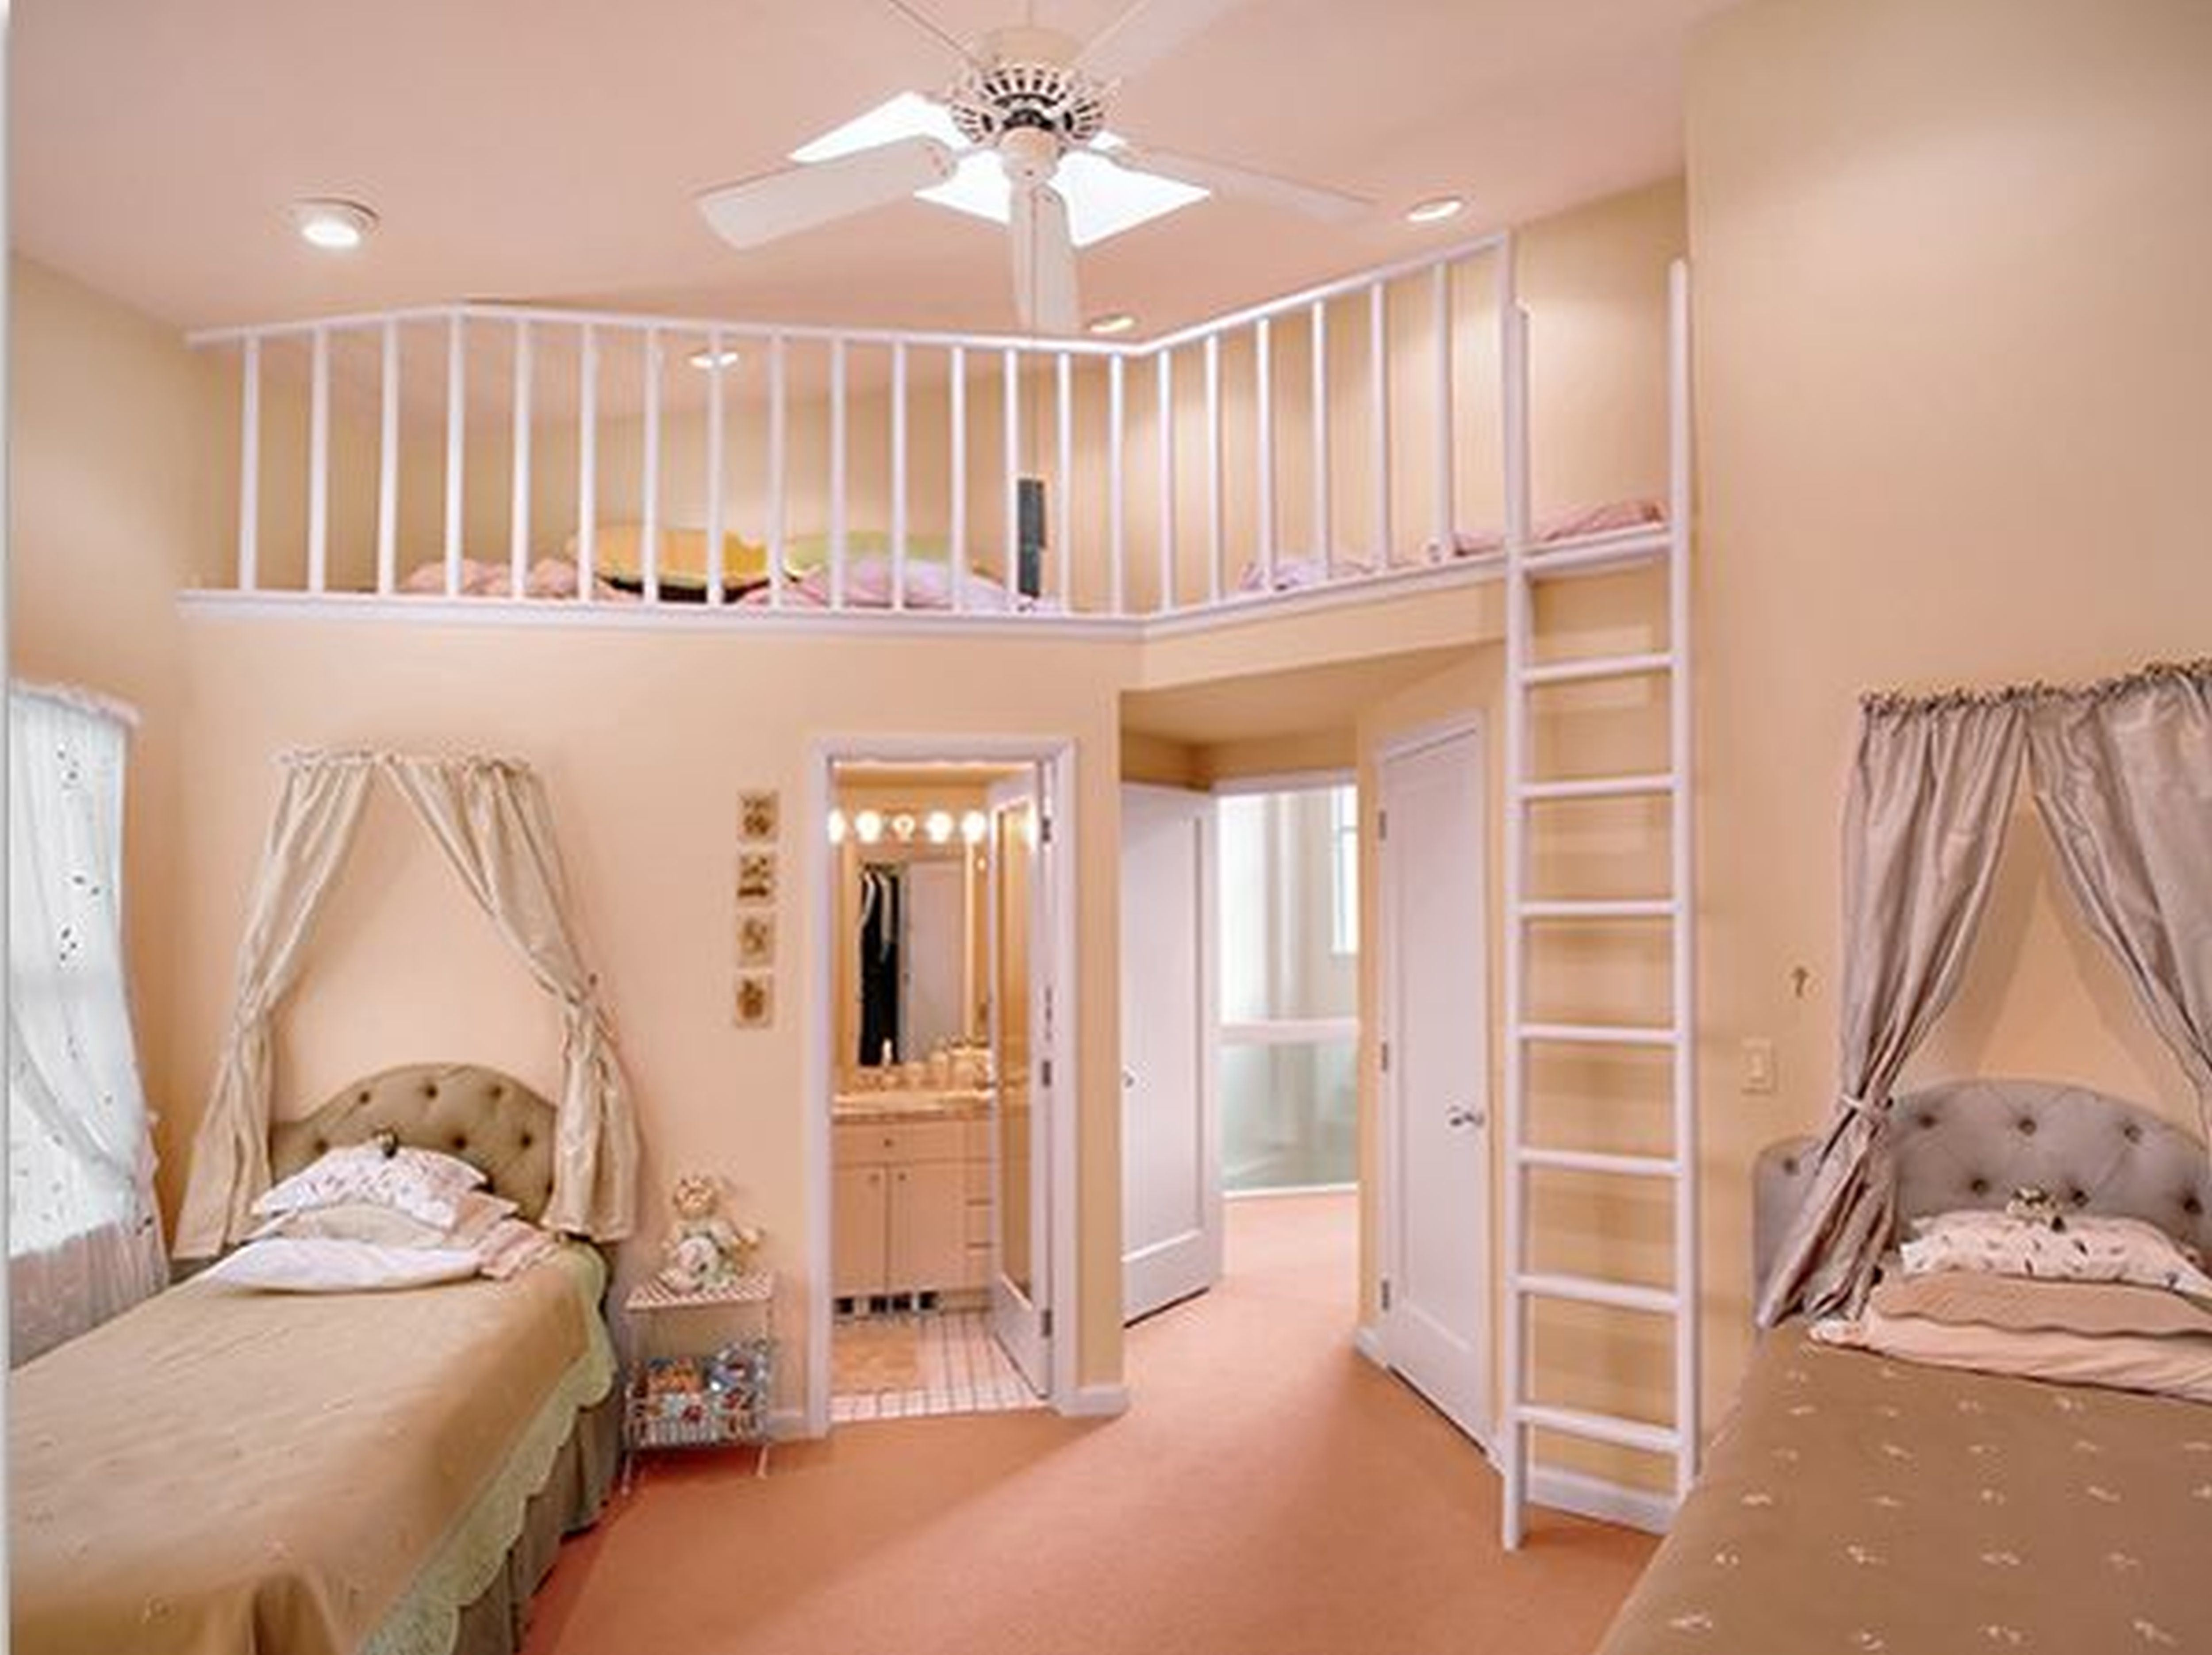 japanese bedroom ideas interior architecture astonishing set on contemporary furniture design minimalist